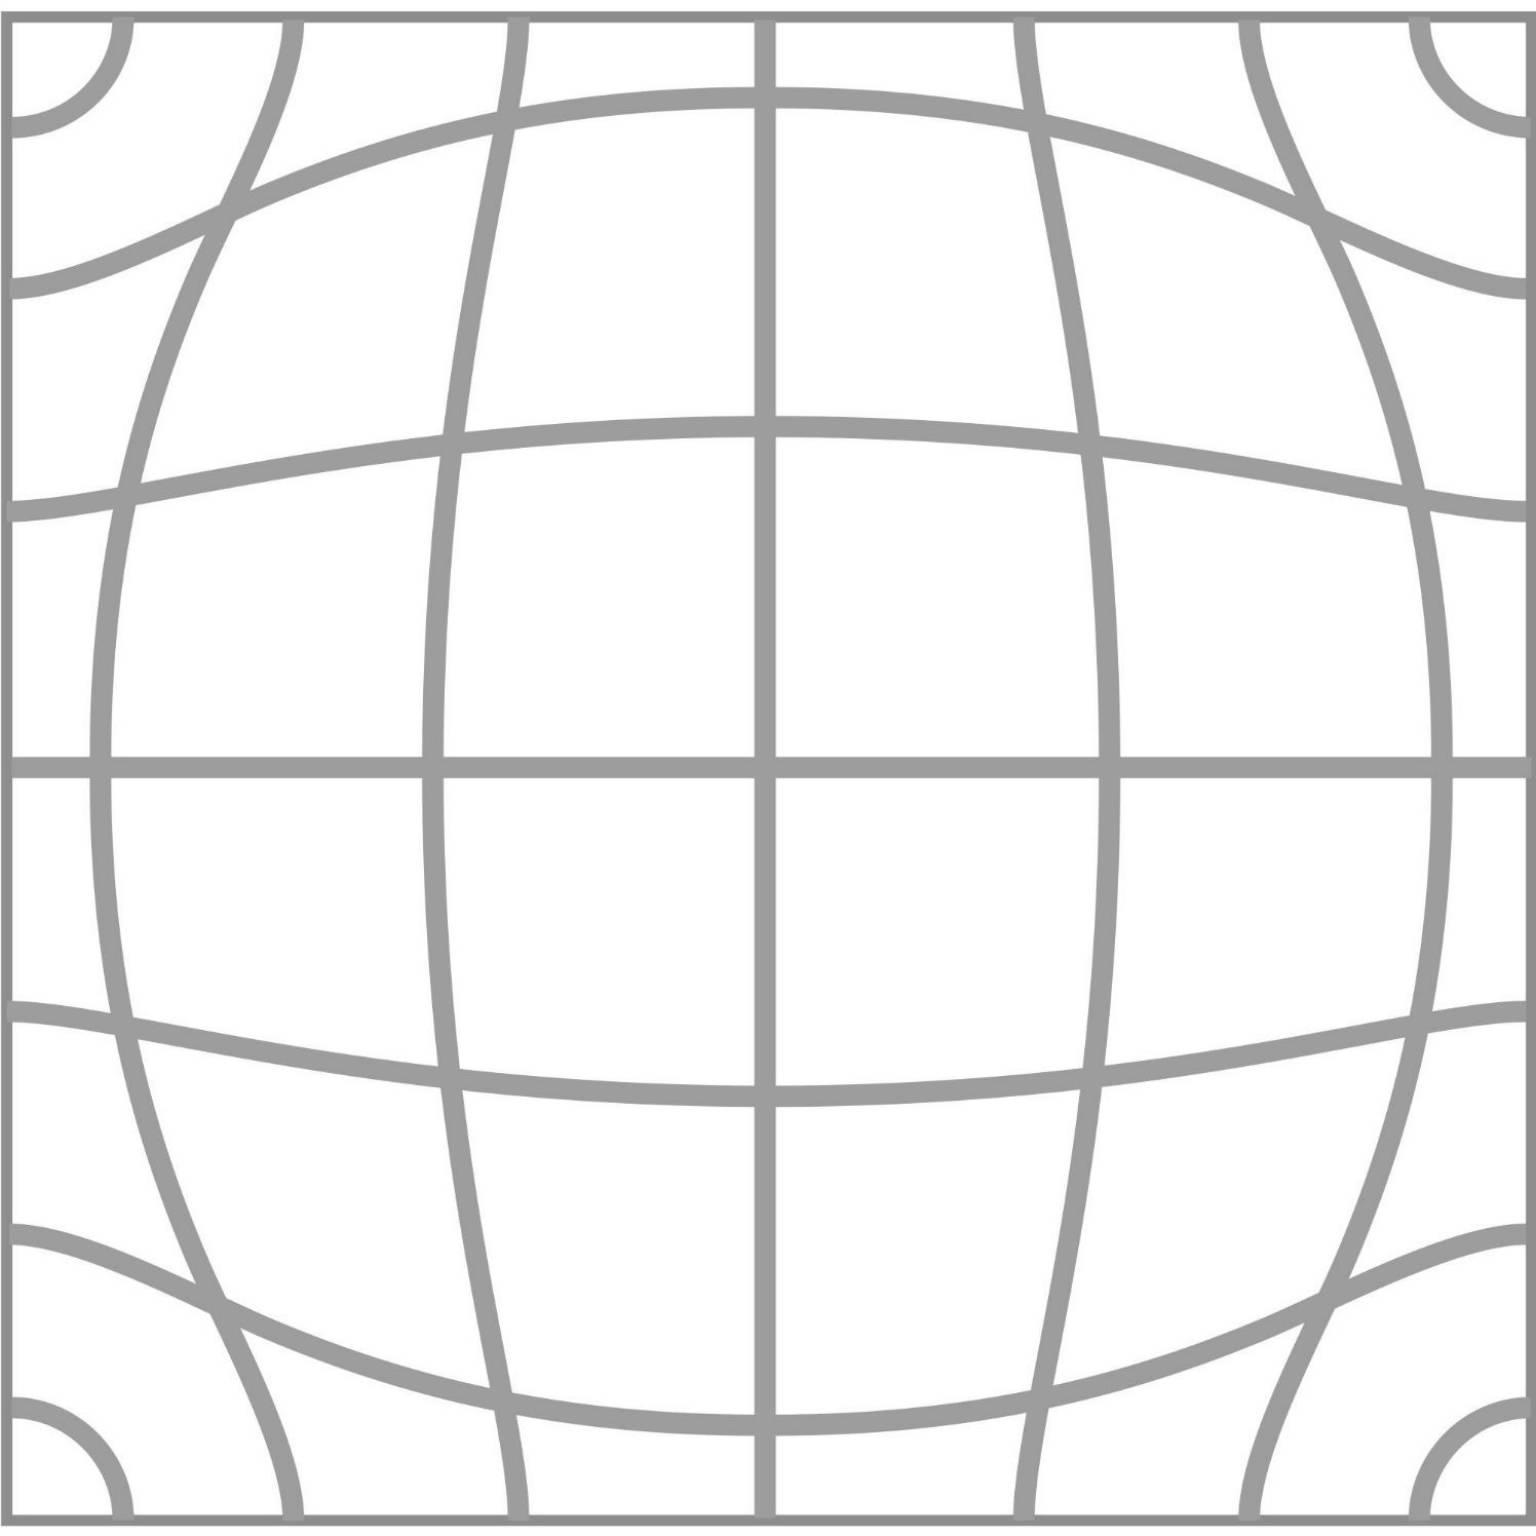 Mod. Tc-6 | Duralmond